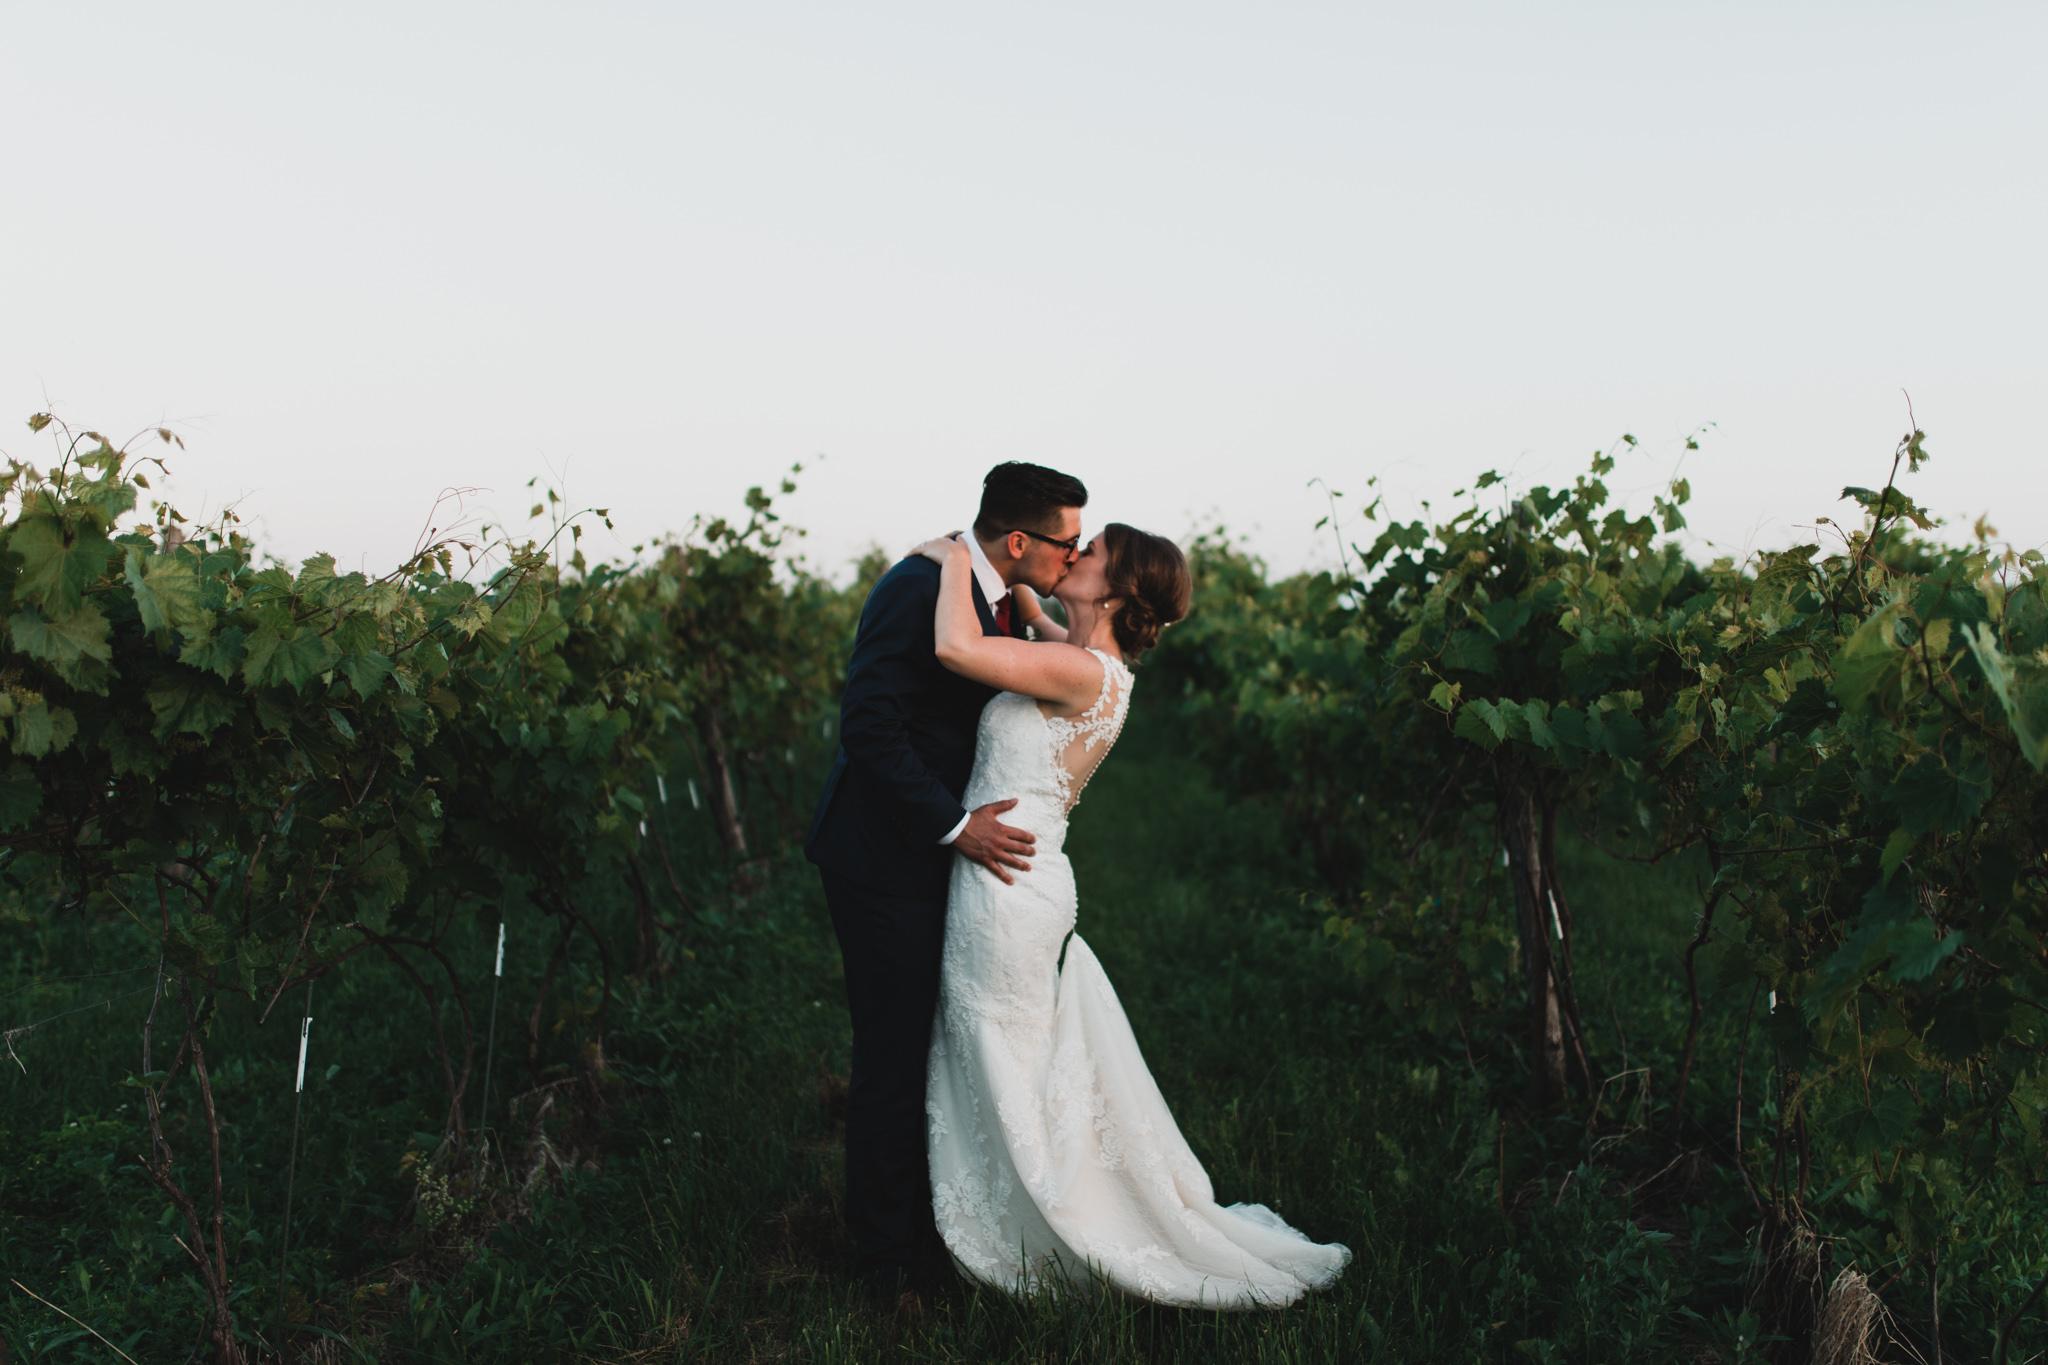 664-WEB-Jonathan-Kuhn-Photography-Susan-Dave-Wedding-3273.jpg